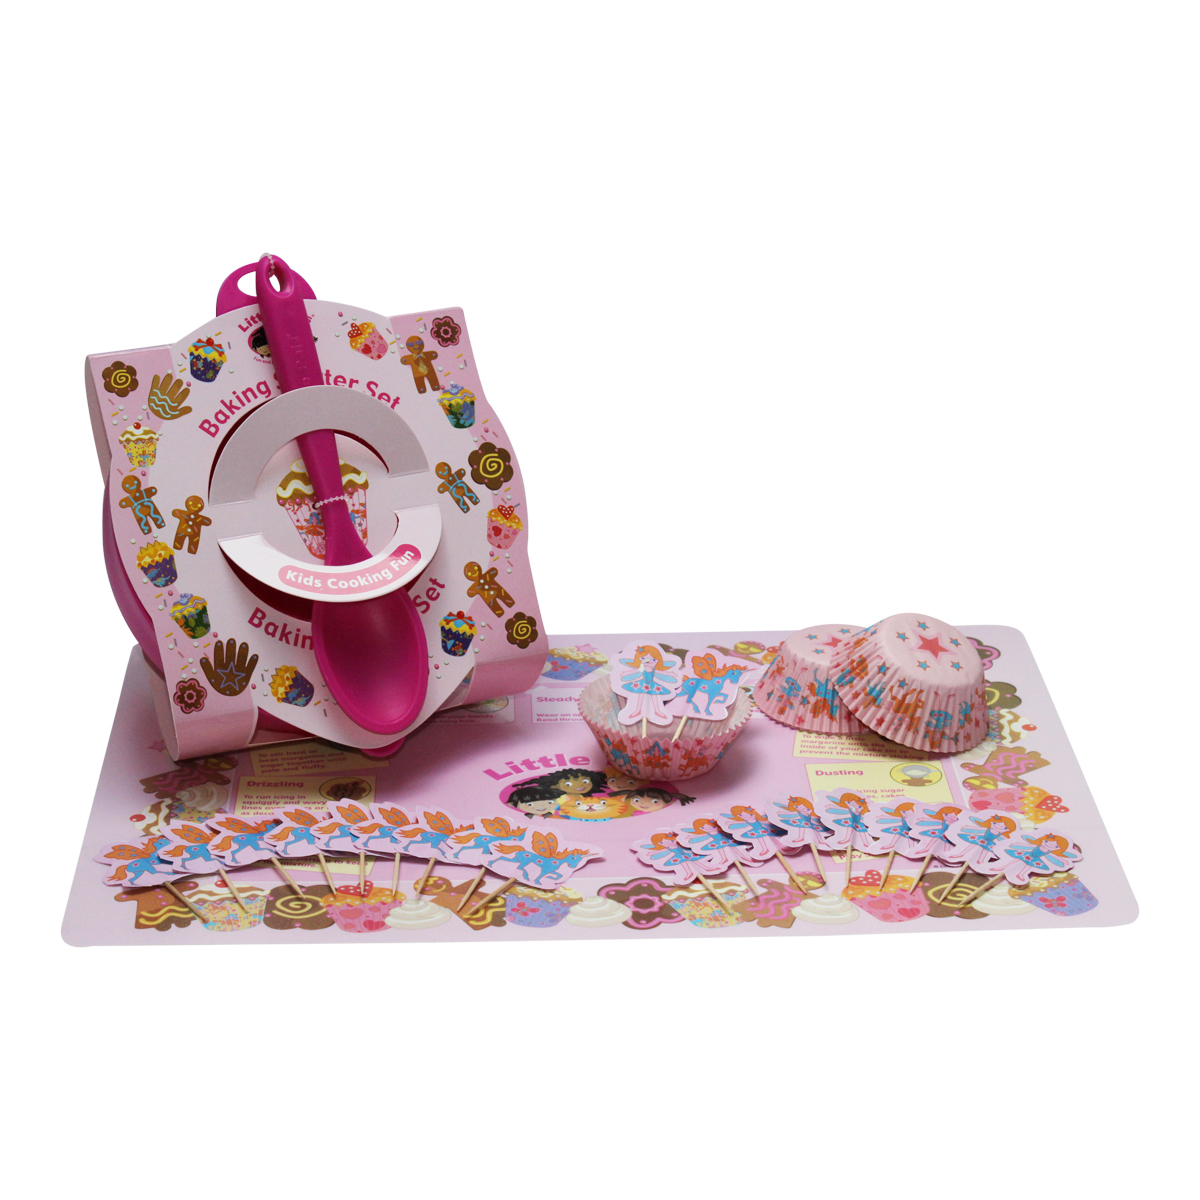 childrens baking starter set, pink